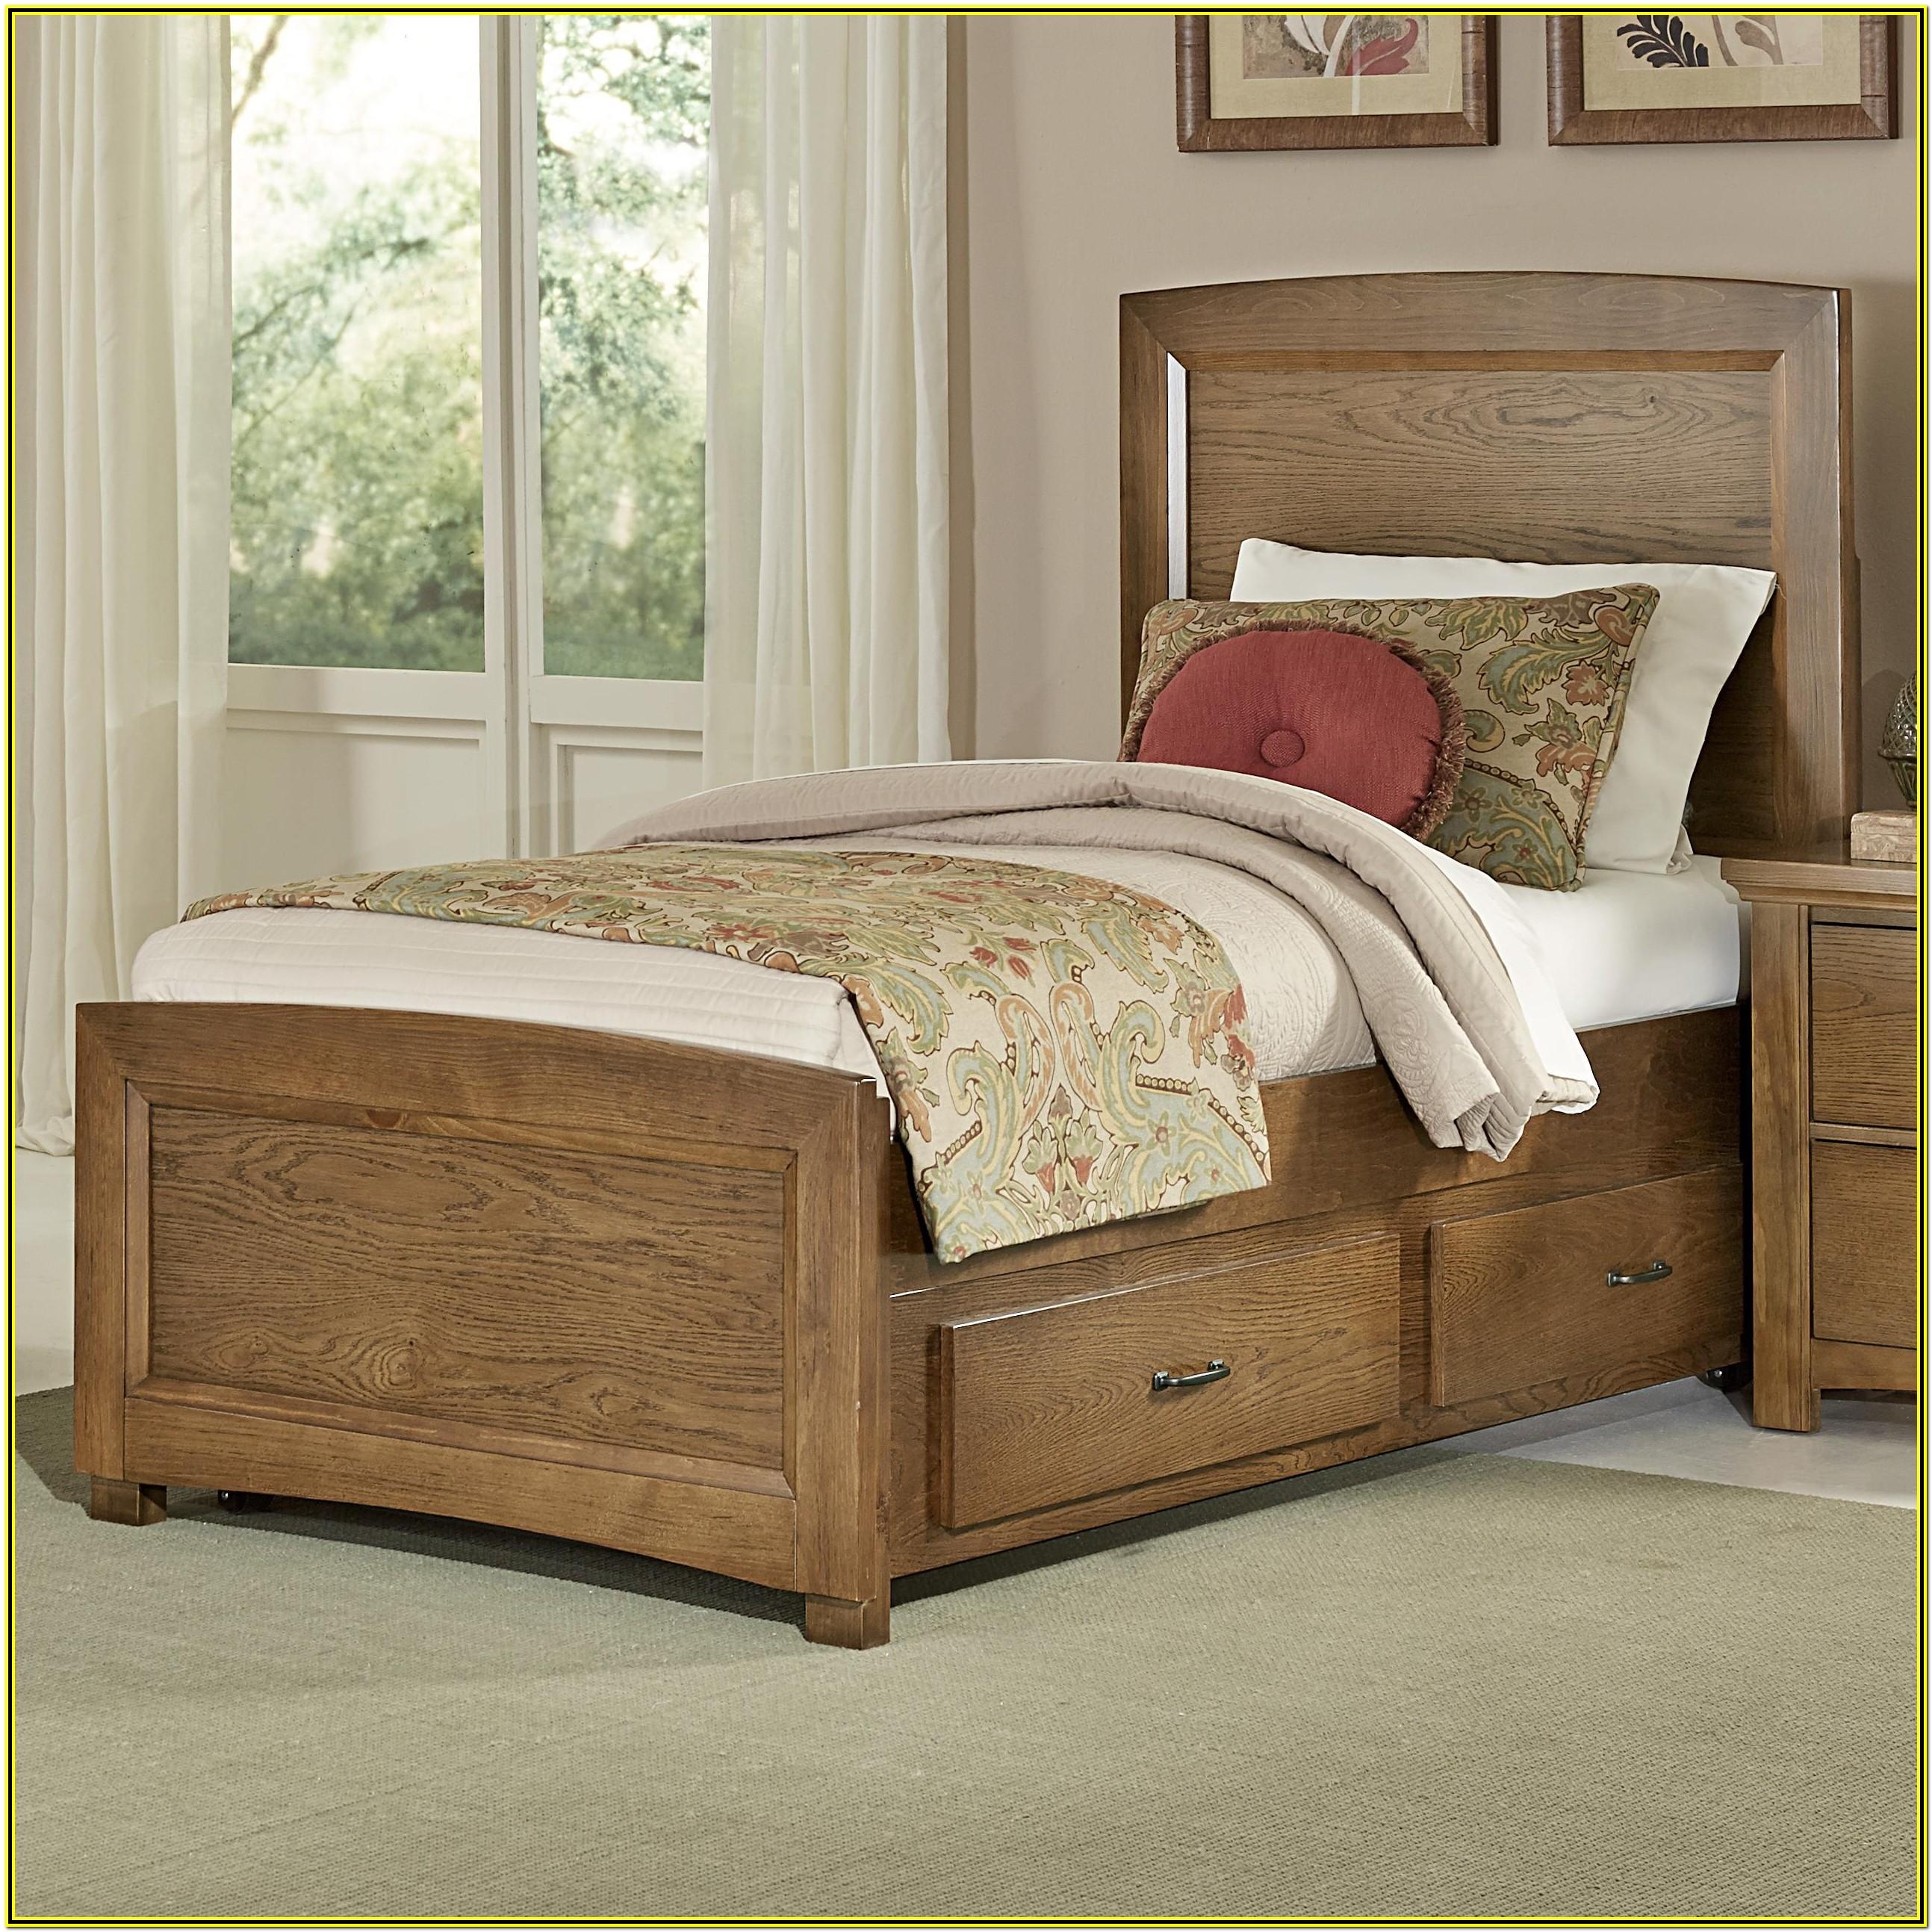 American Furniture Warehouse Platform Beds